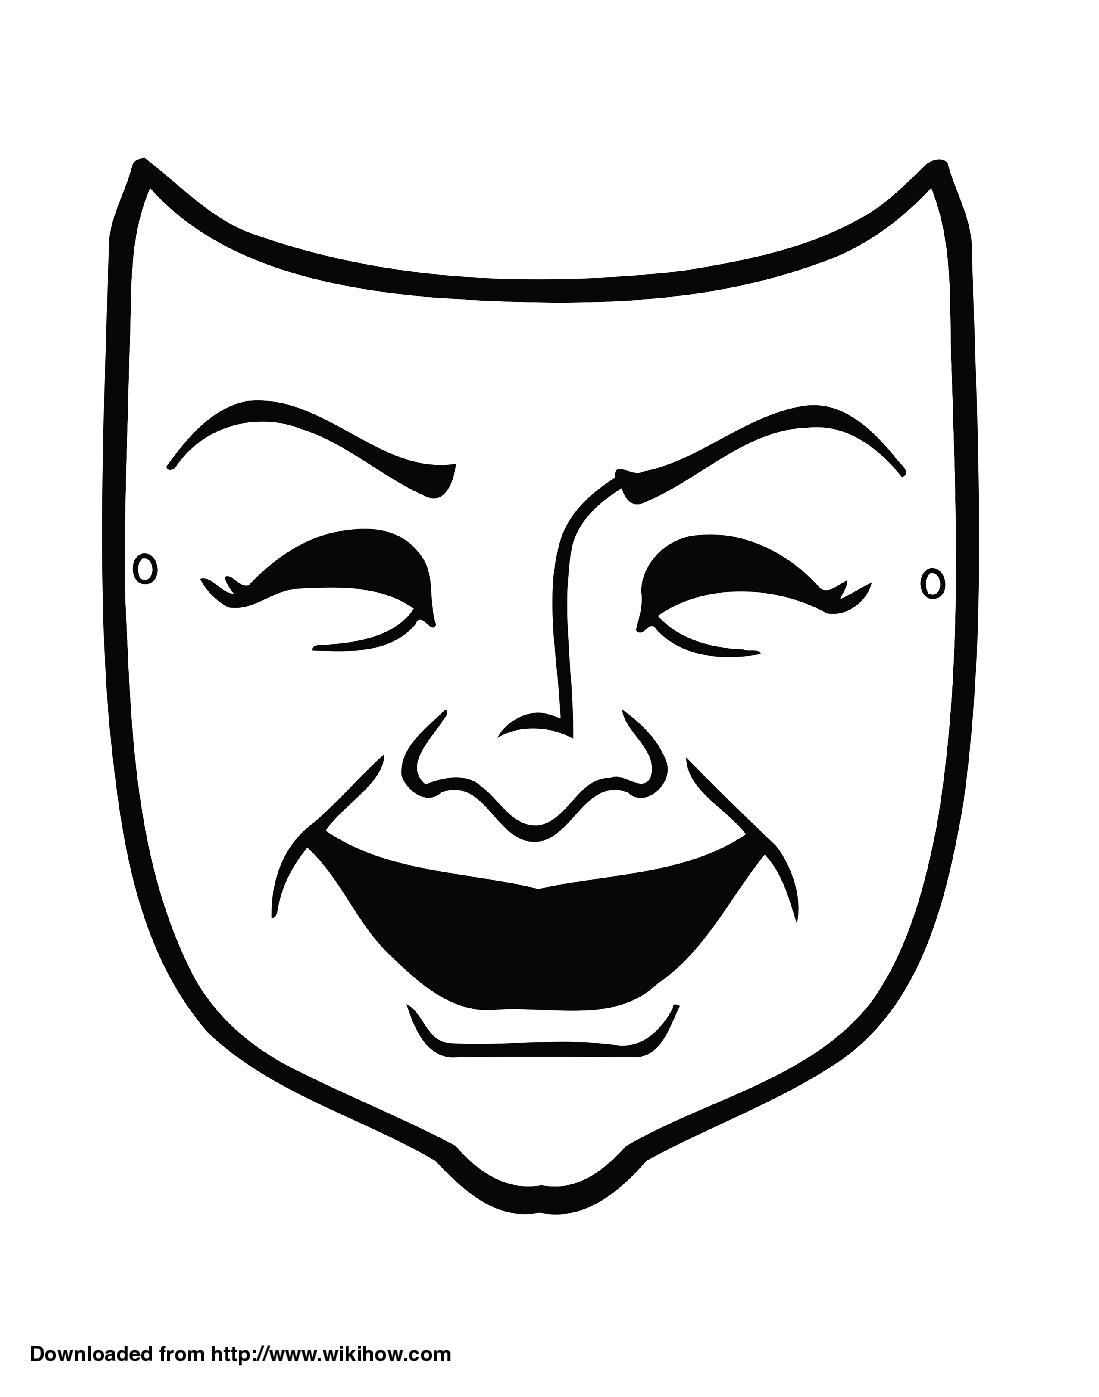 Sample Comedy Mask Wikihow In 2021 Theatre Masks Drama Masks Greek Drama Masks